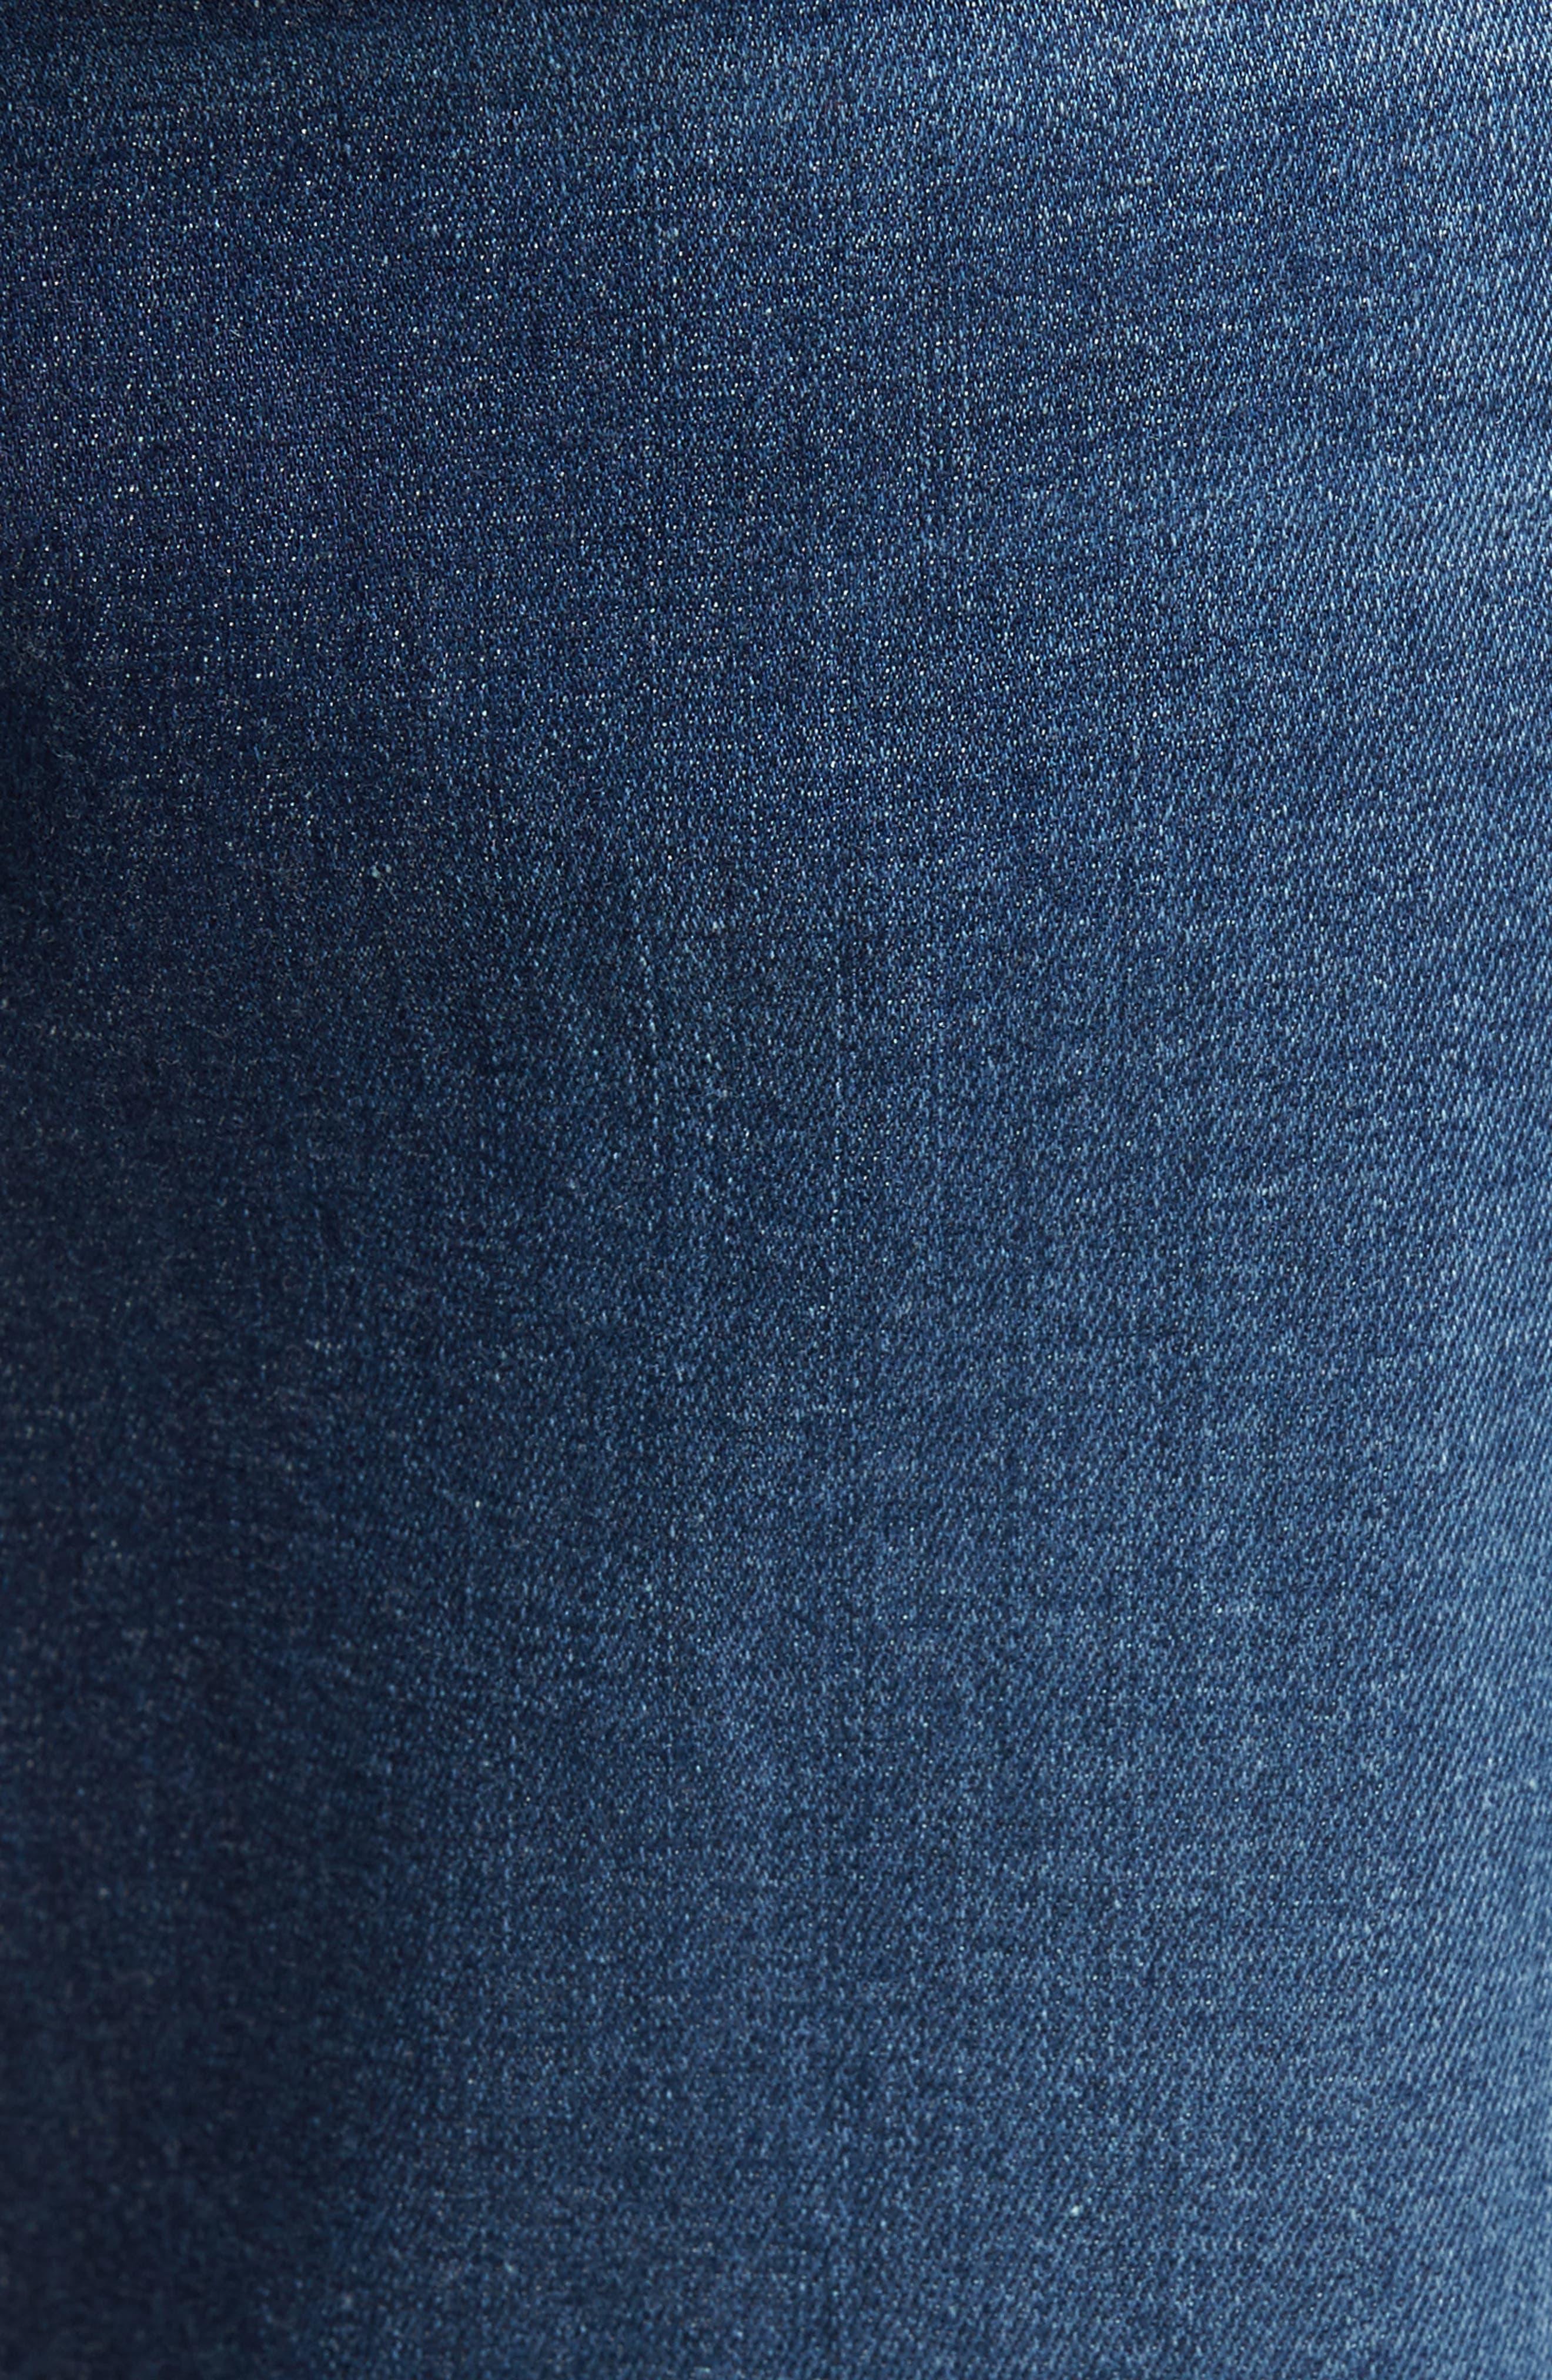 Slimmy Slim Fit Jeans,                             Alternate thumbnail 5, color,                             406